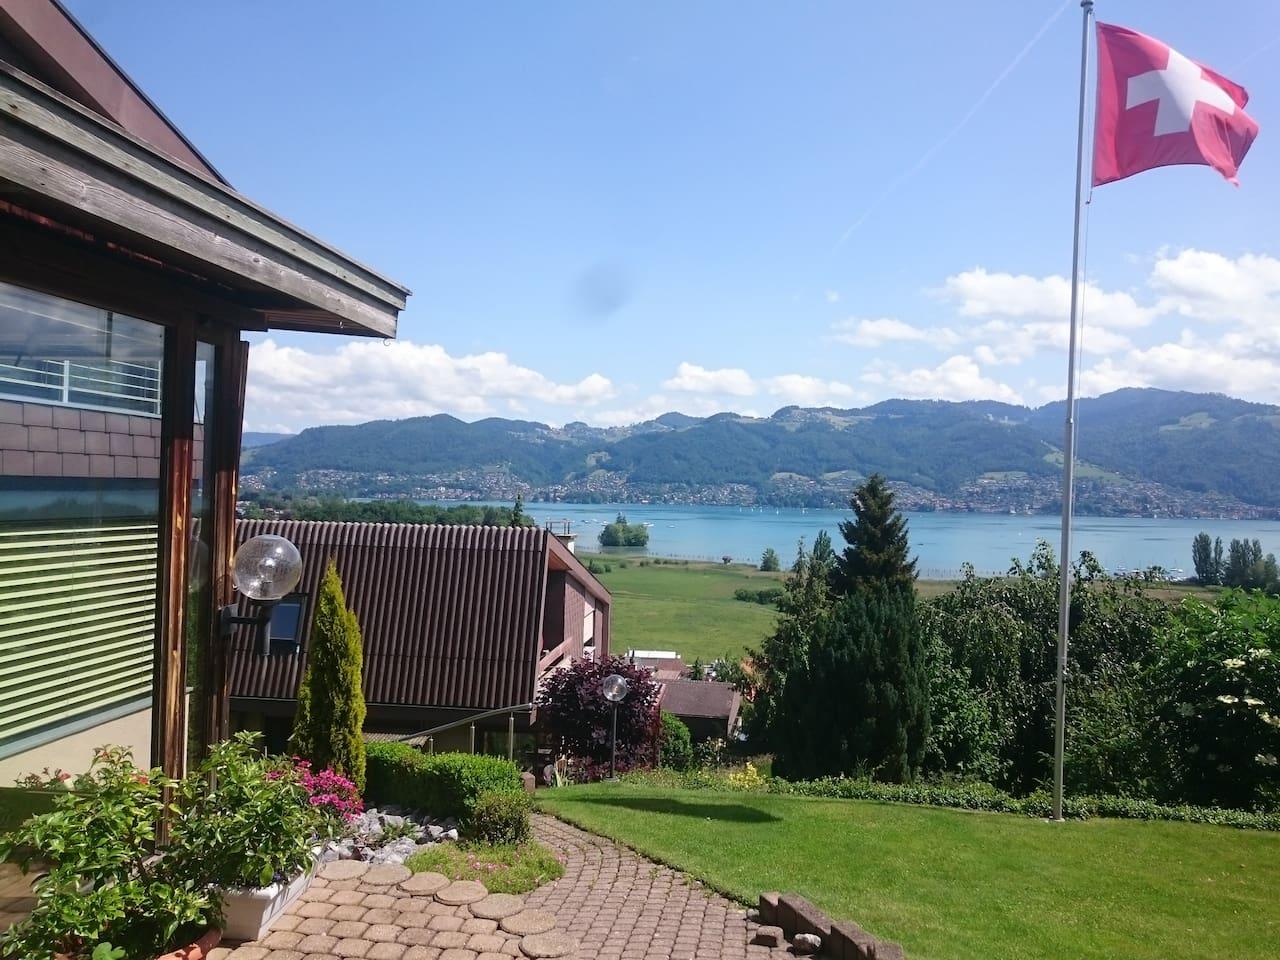 Blick von Terrasse/ views from the terrace